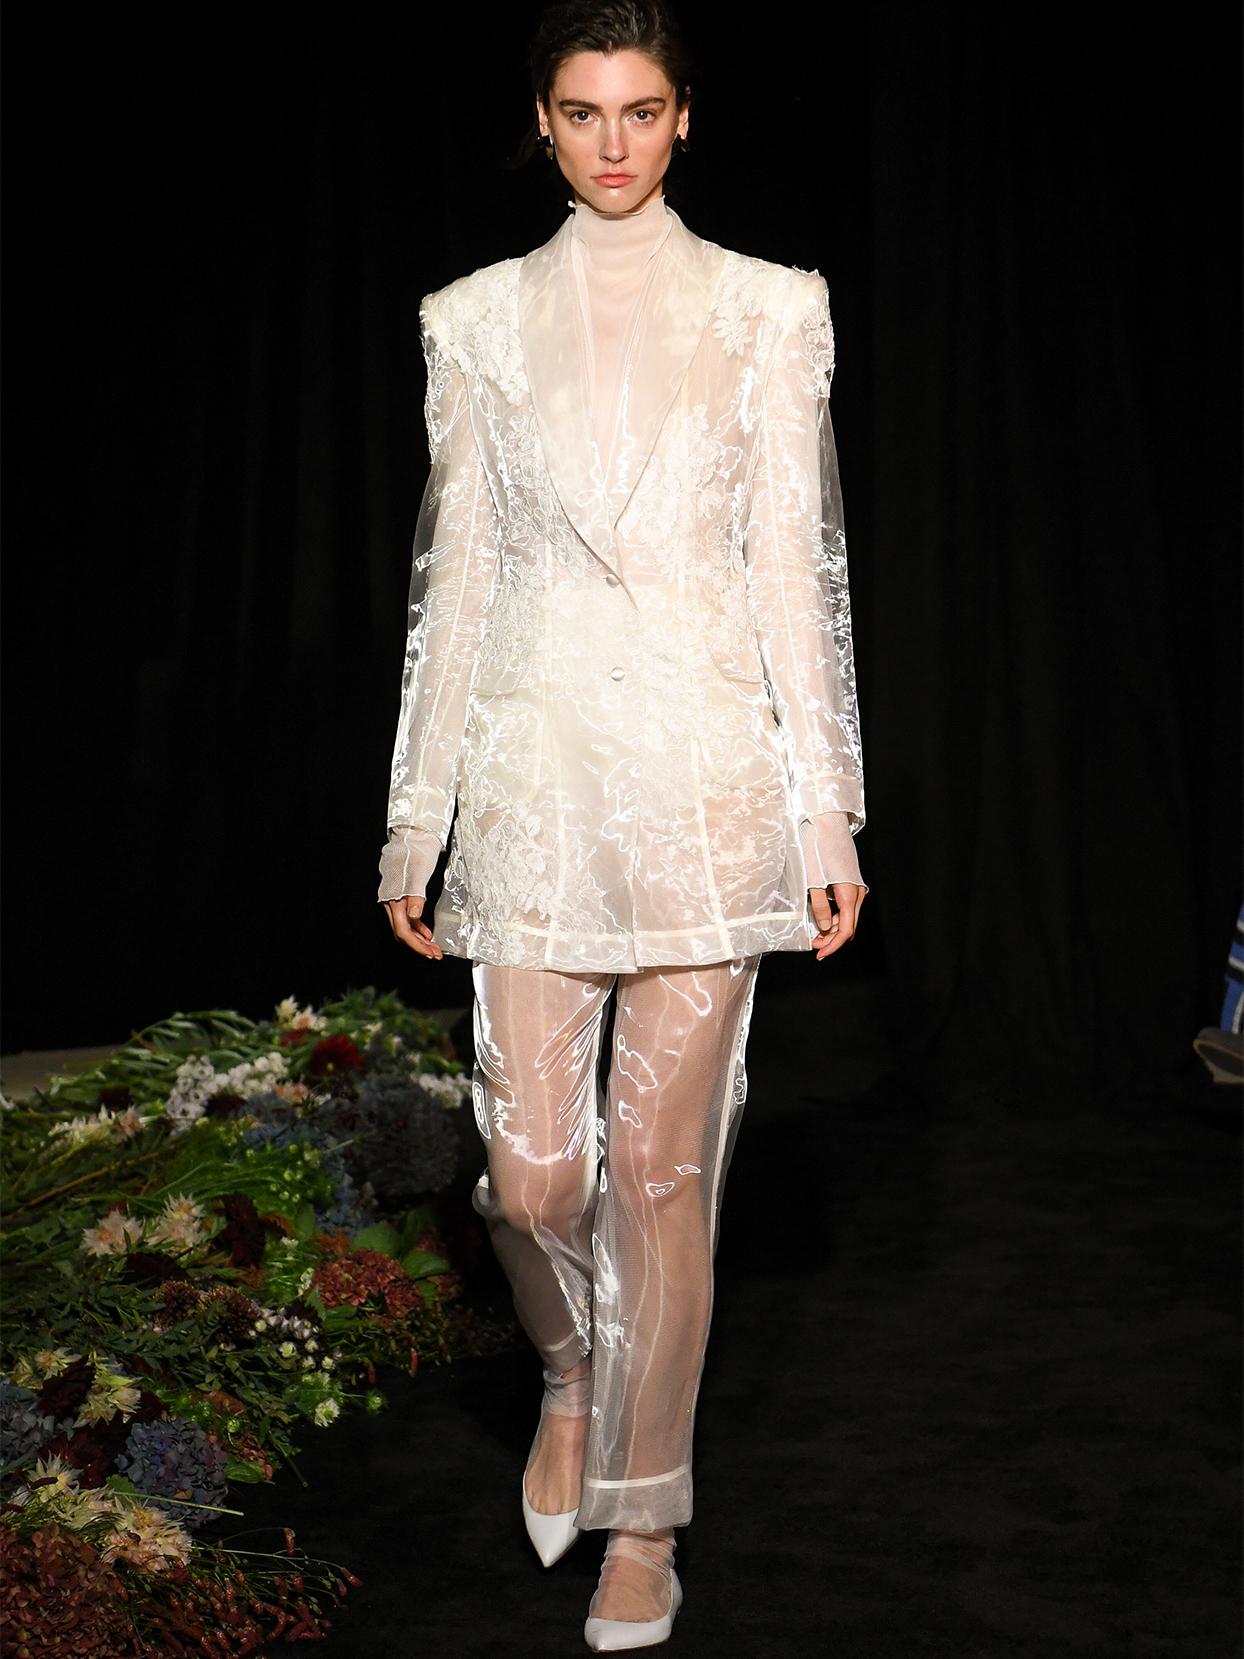 danielle frankel sheer flowered coat pantsuit wedding dress fall 2020